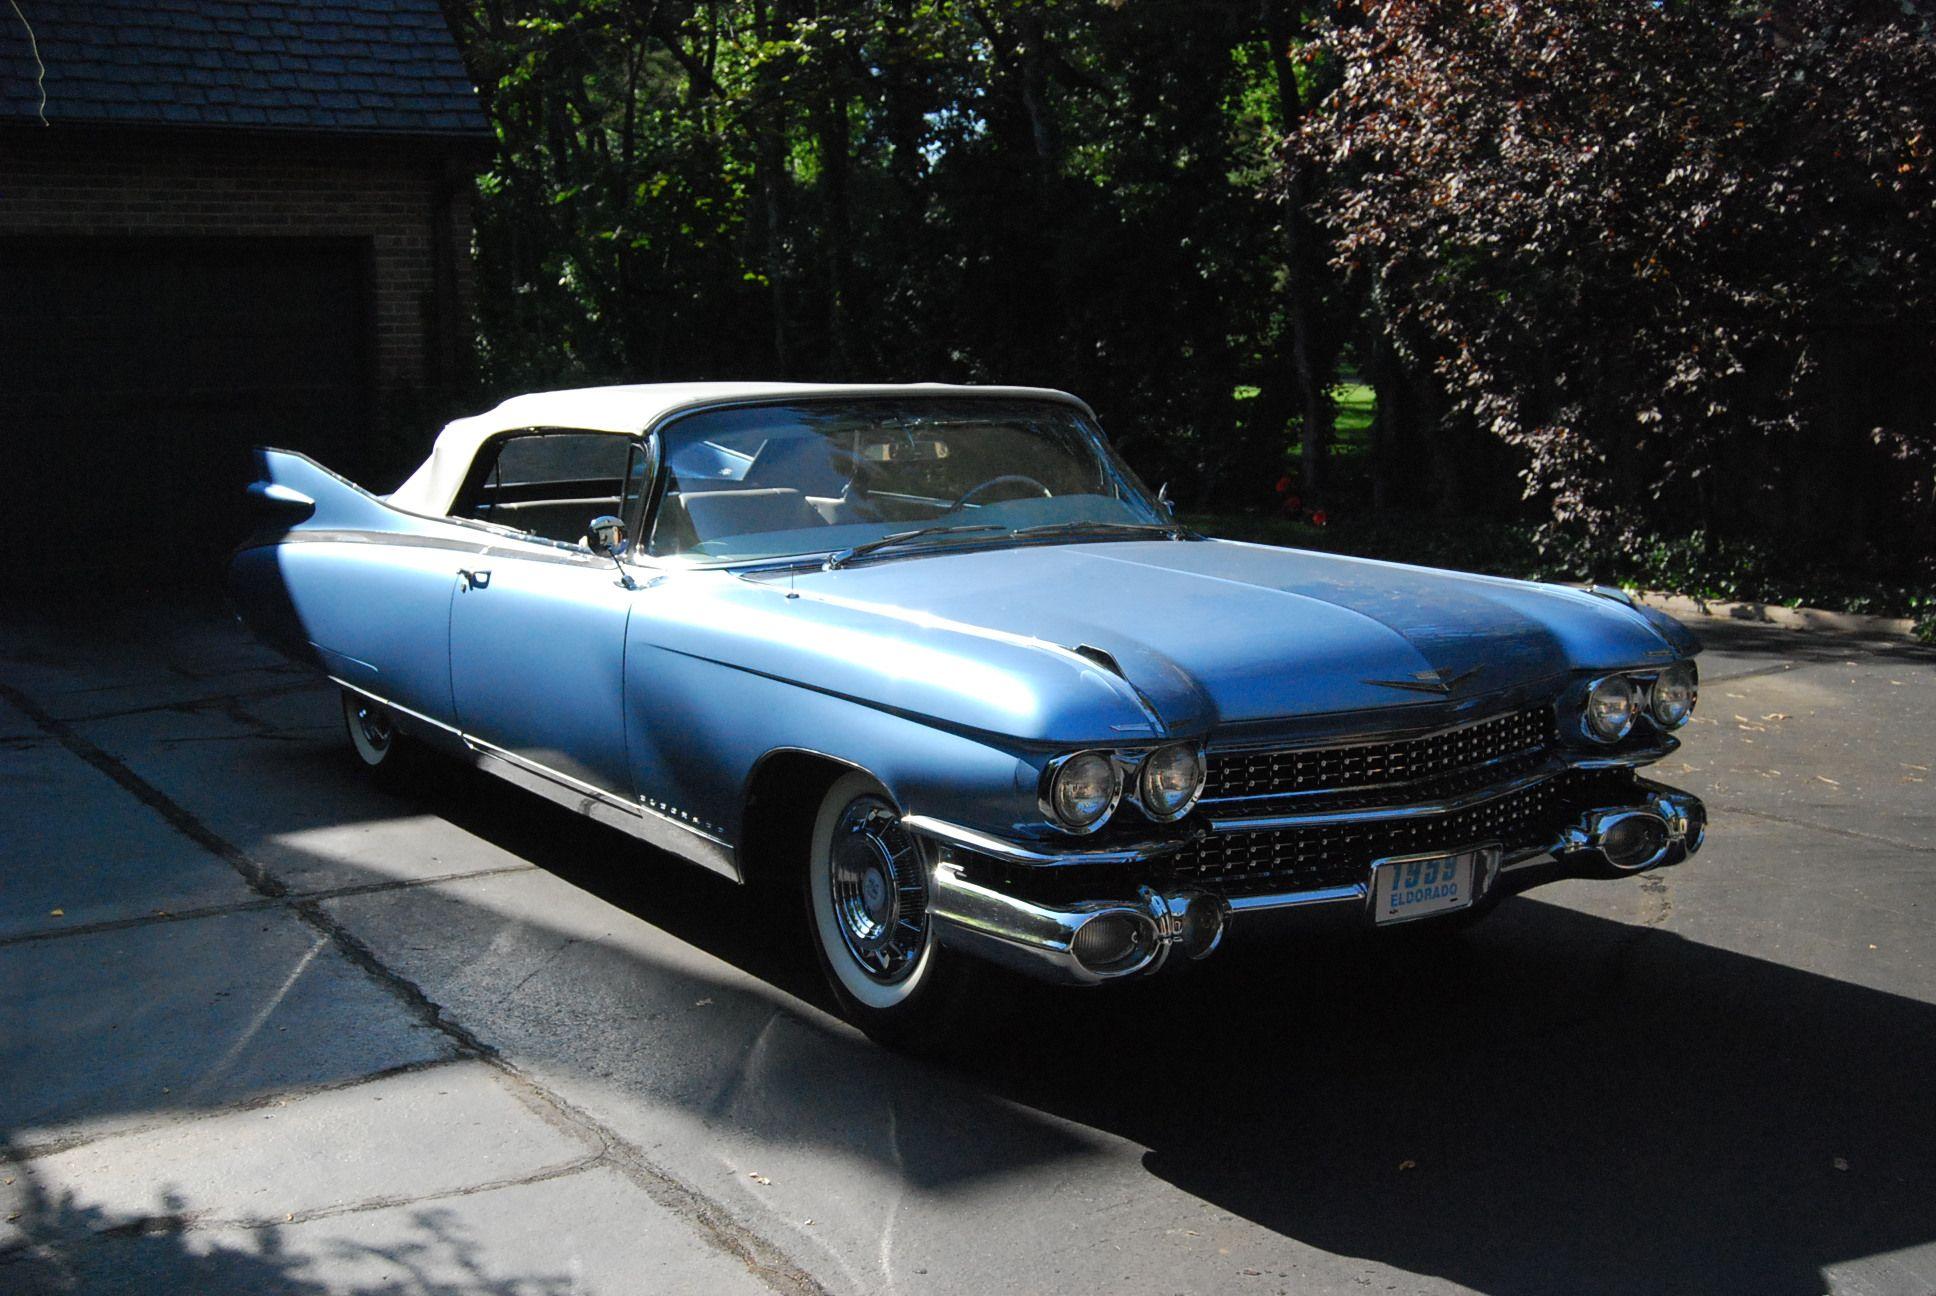 1959 Cadillac Eldorado Biarritz Convertible One Of 99 Built For Sale